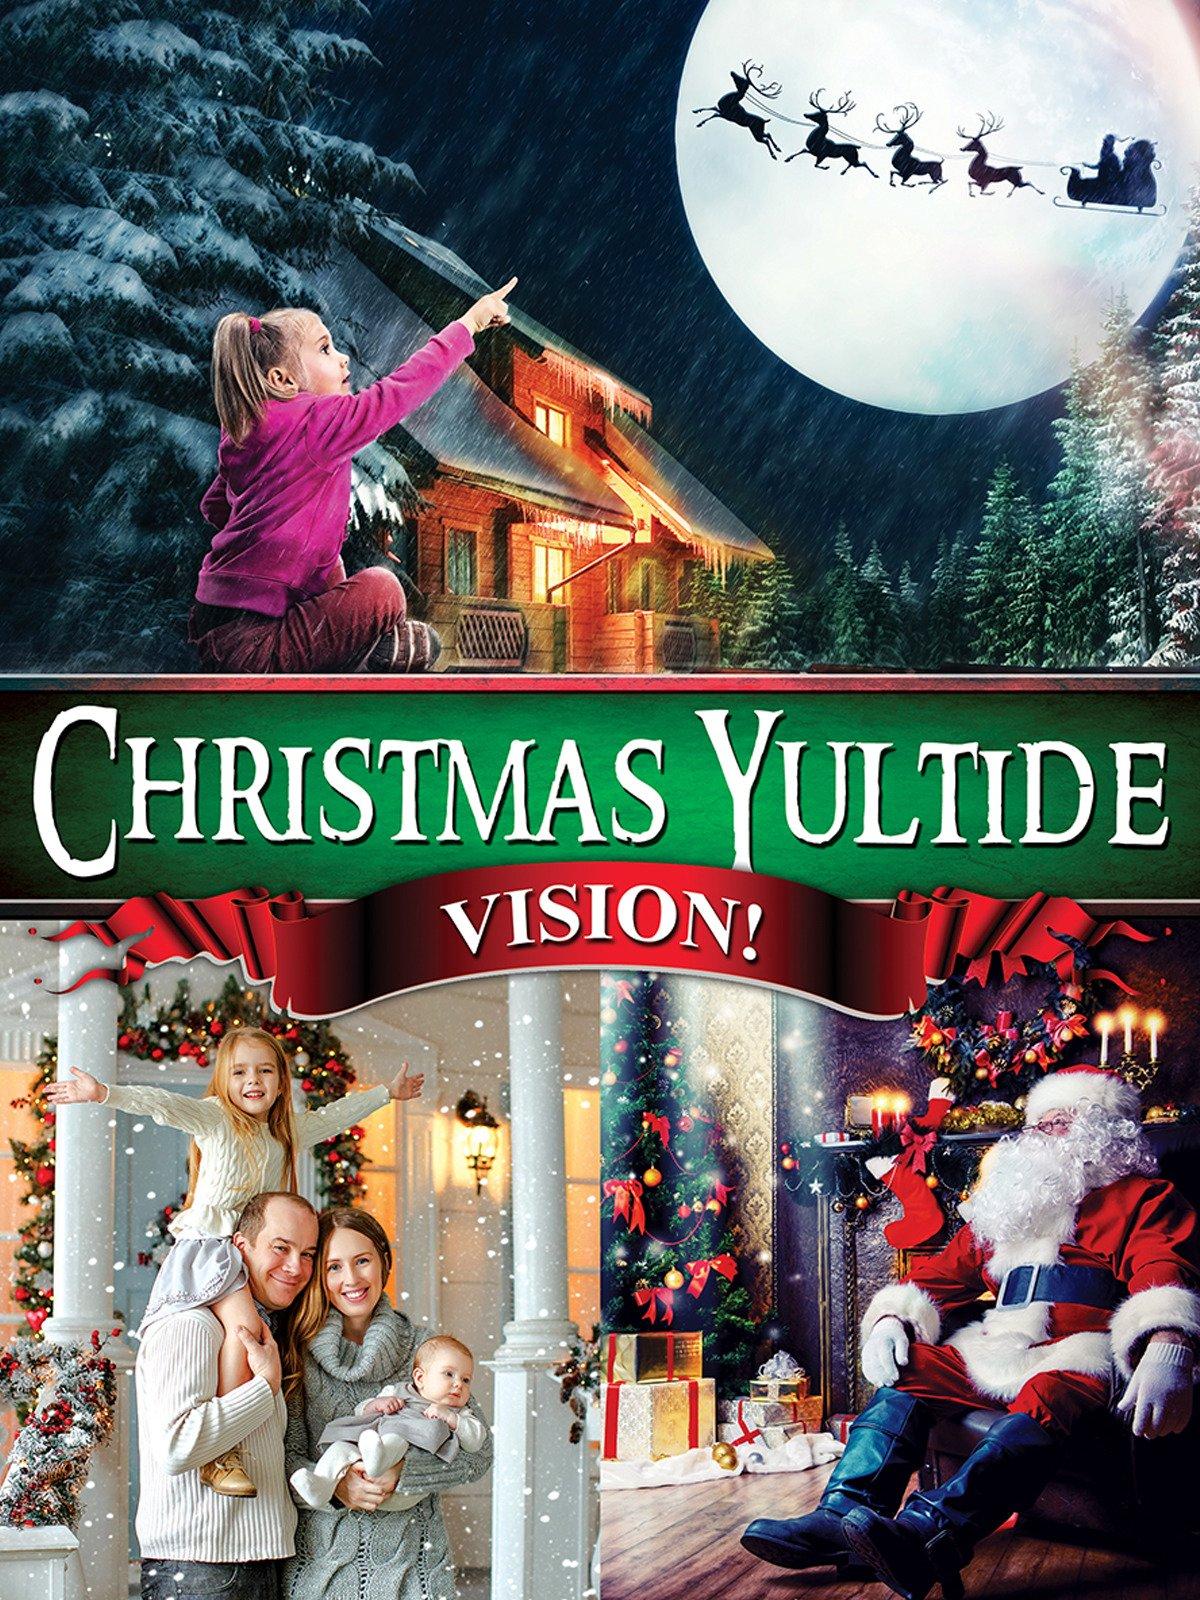 Christmas Yuletide Vision